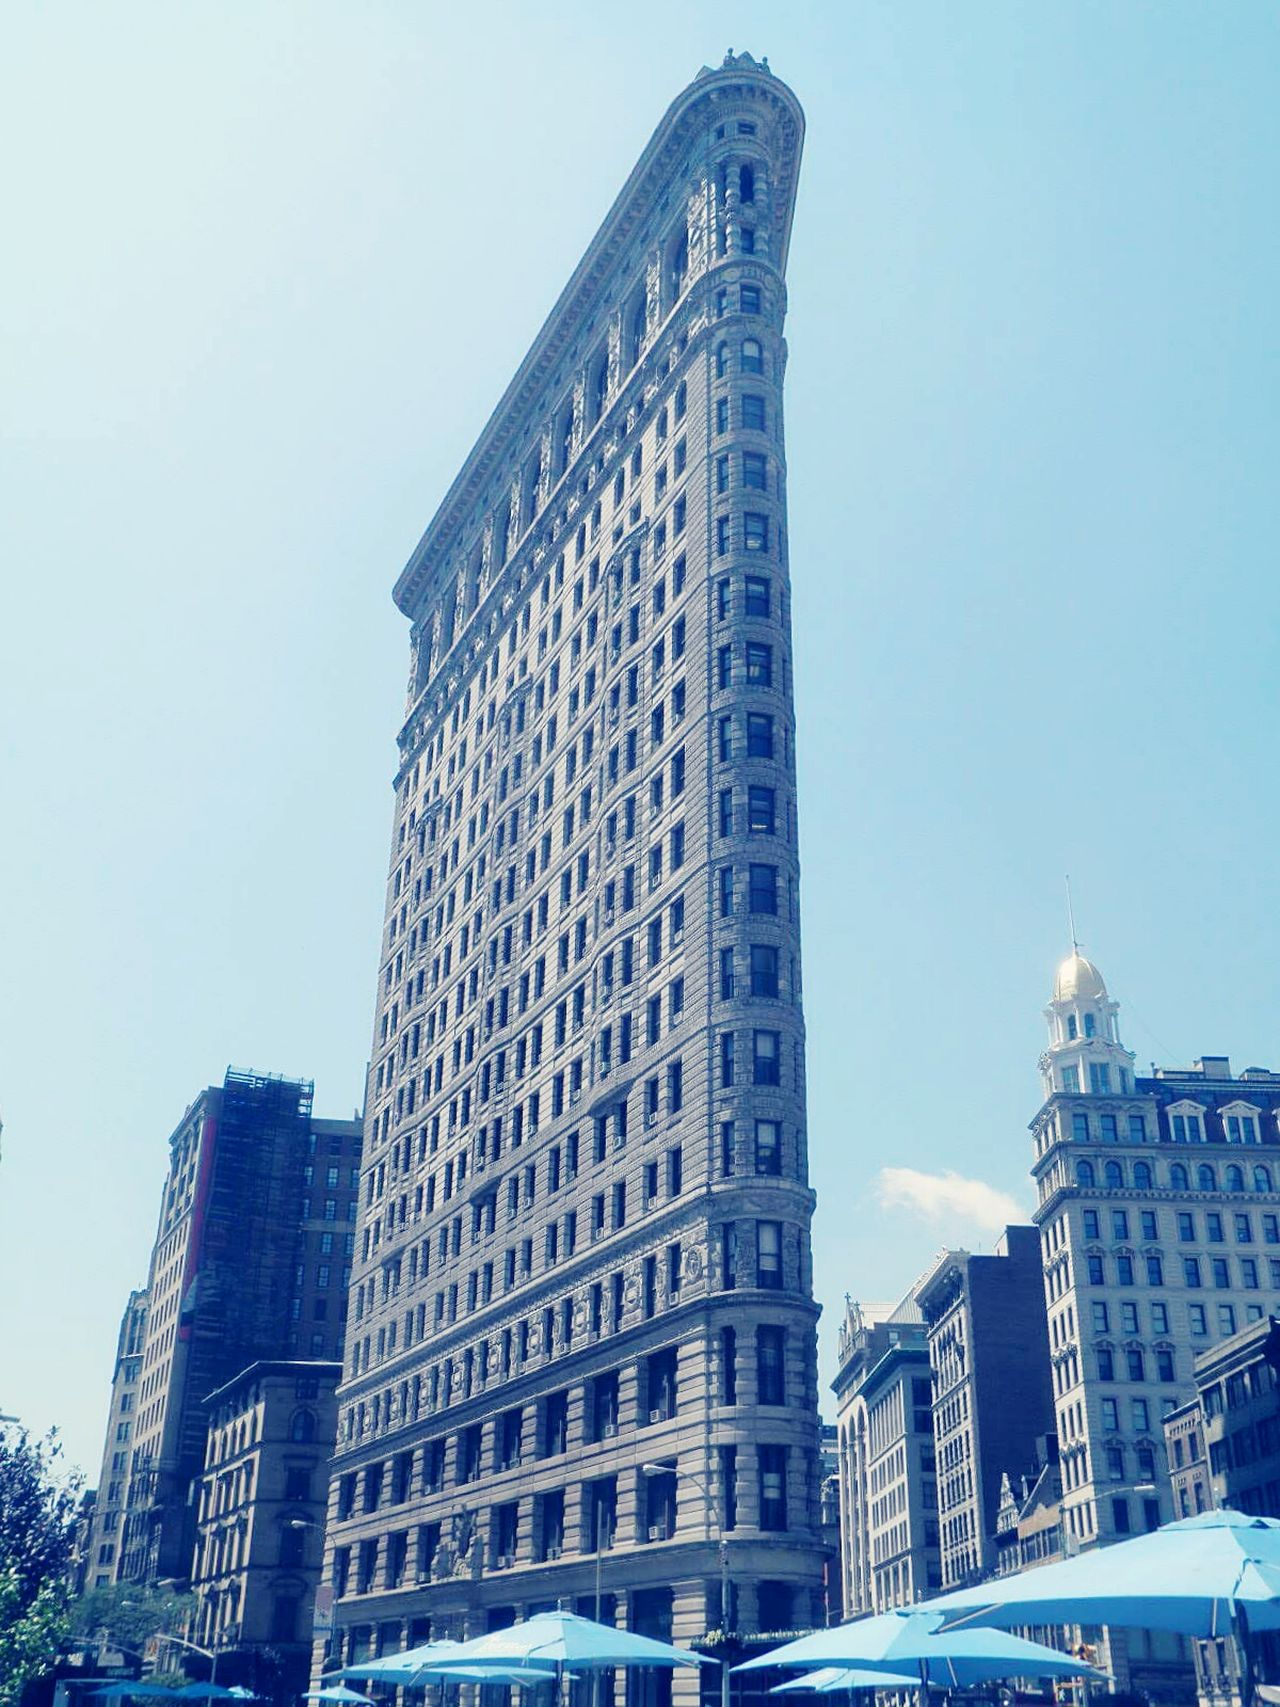 Beautiful stock photos of gebäude, Architecture, Building Exterior, Built Structure, Capital Cities